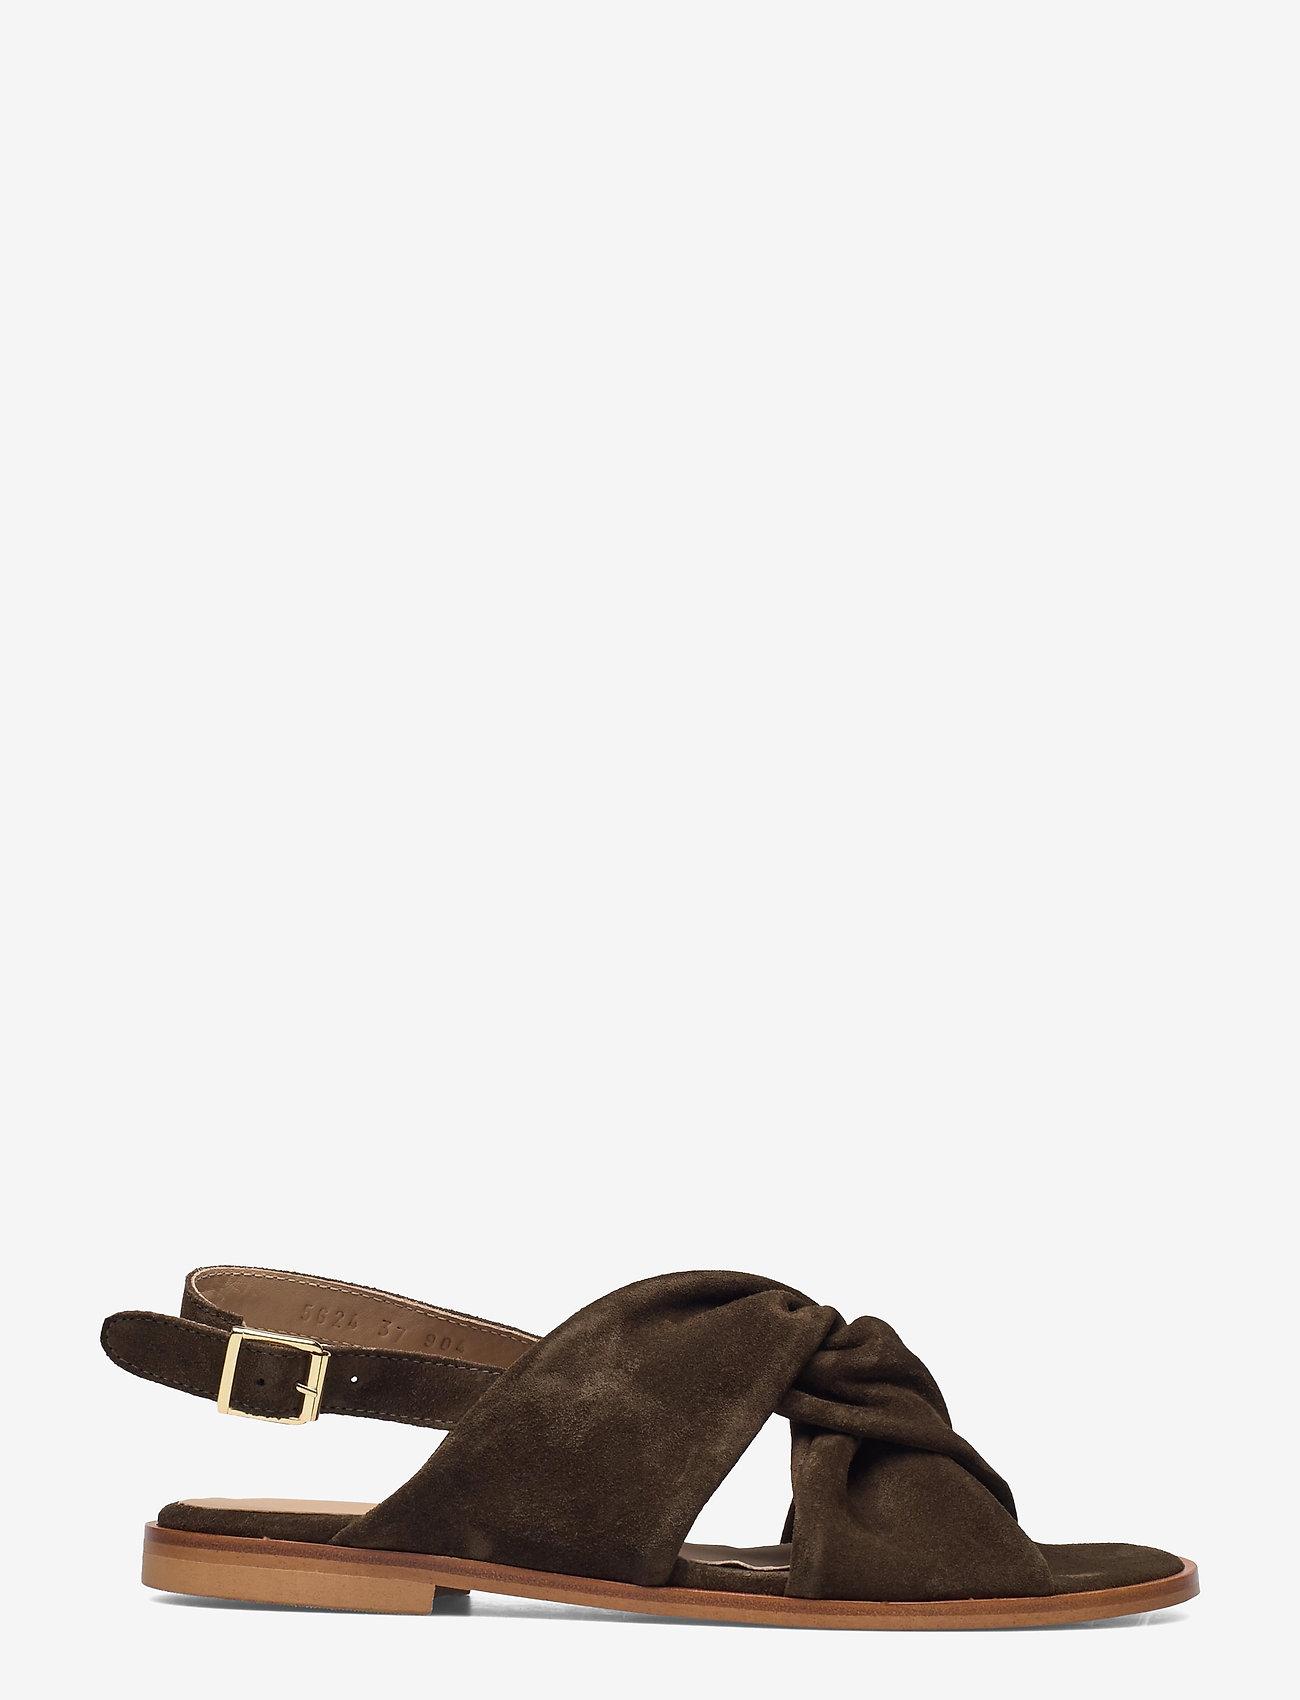 ANGULUS - Sandals - flat - open toe - op - flache sandalen - 2214 dark olive - 1